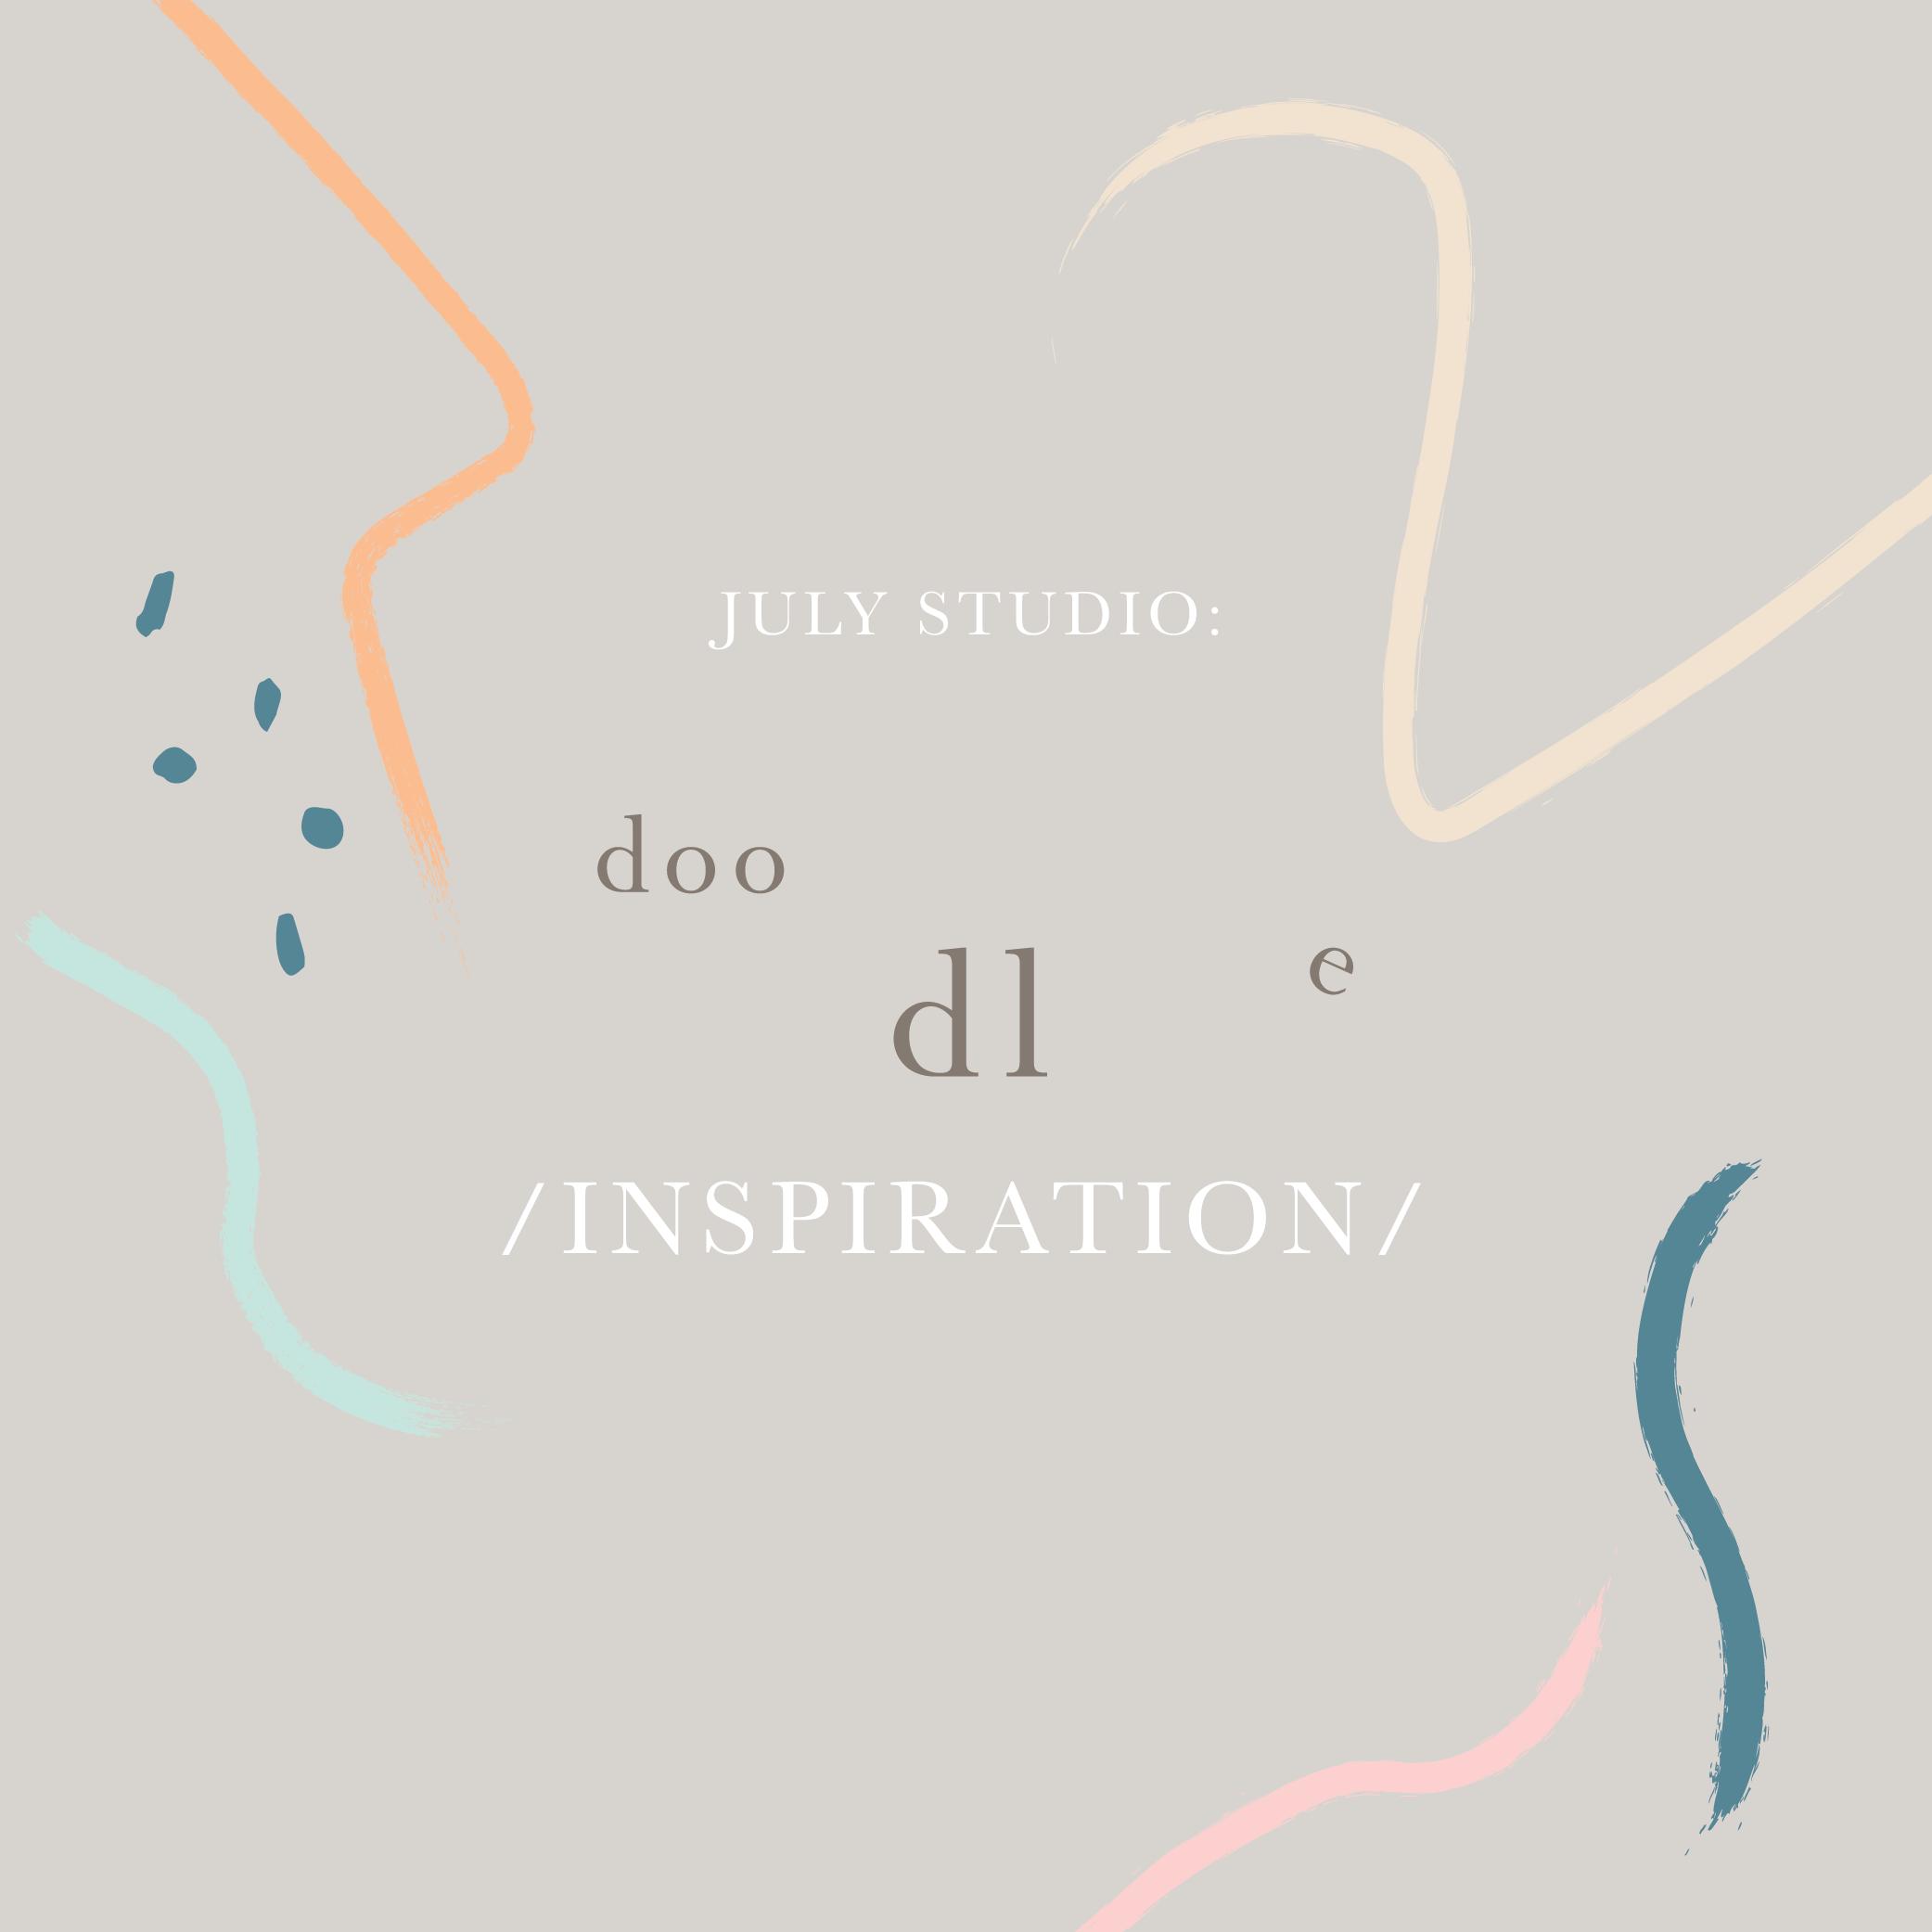 July Studio: Doodle